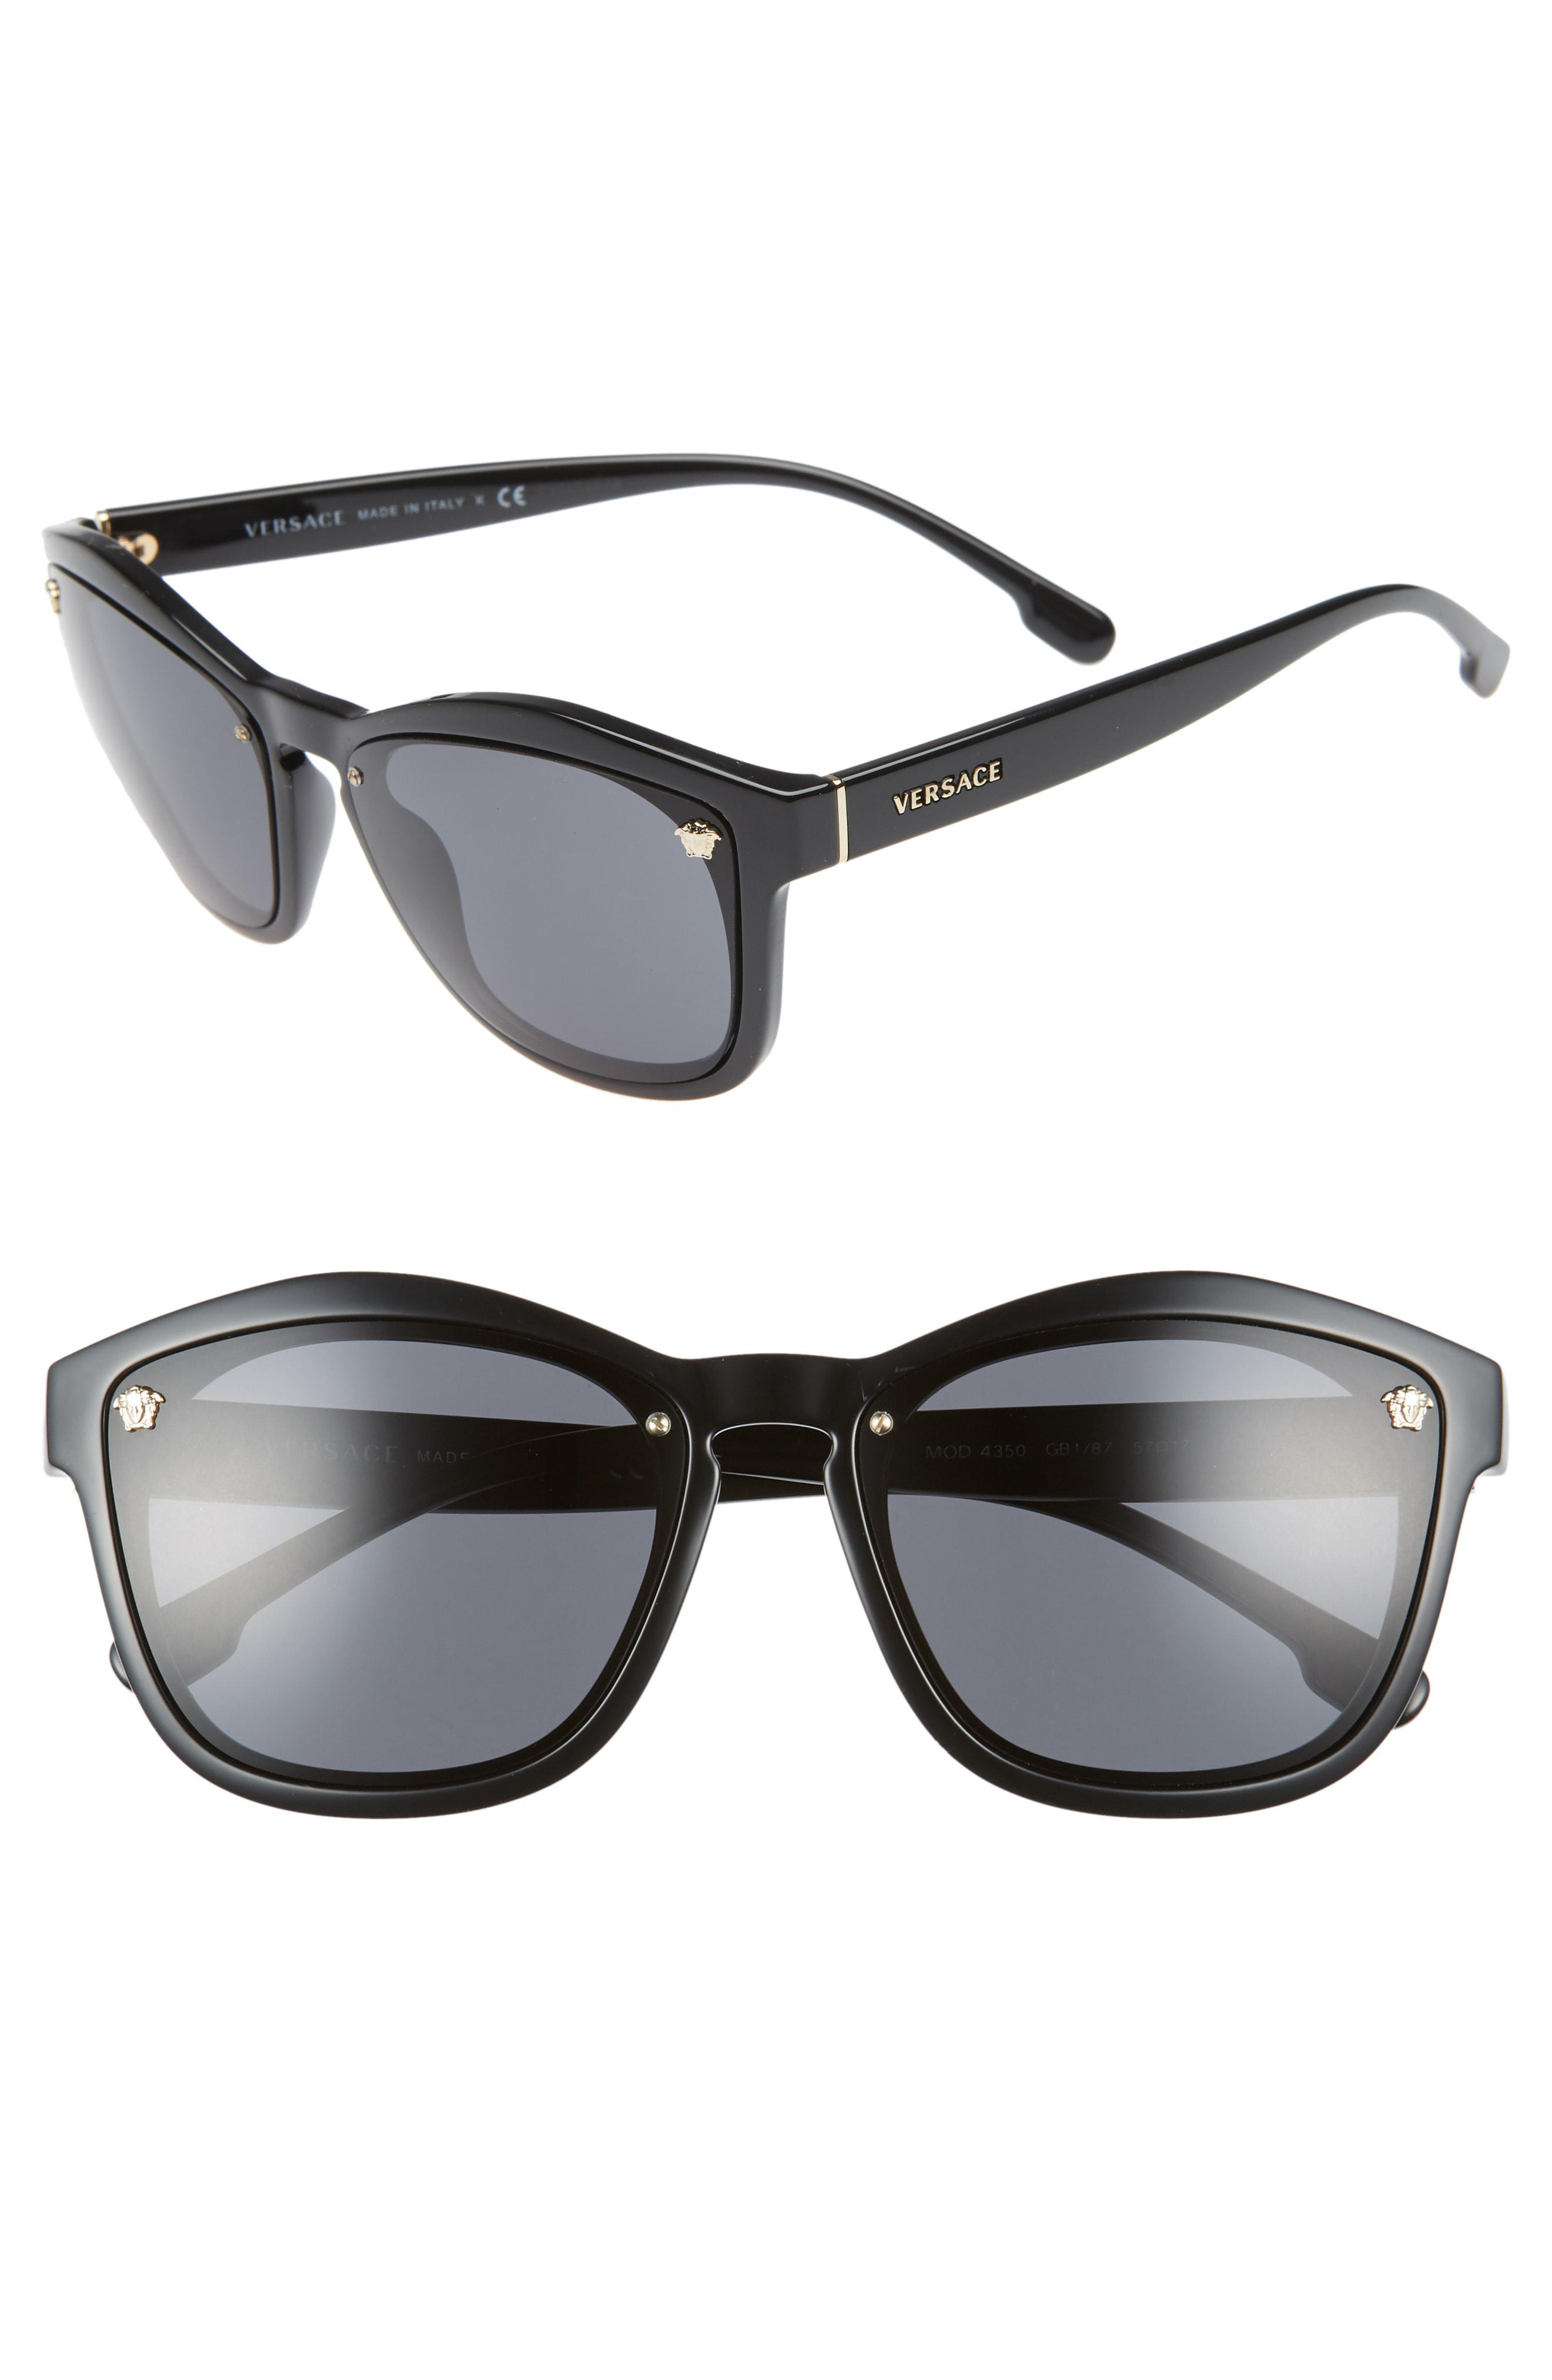 96b1dd49dba3 Versace - Black Medusa 57mm Square Sunglasses - Lyst. View fullscreen